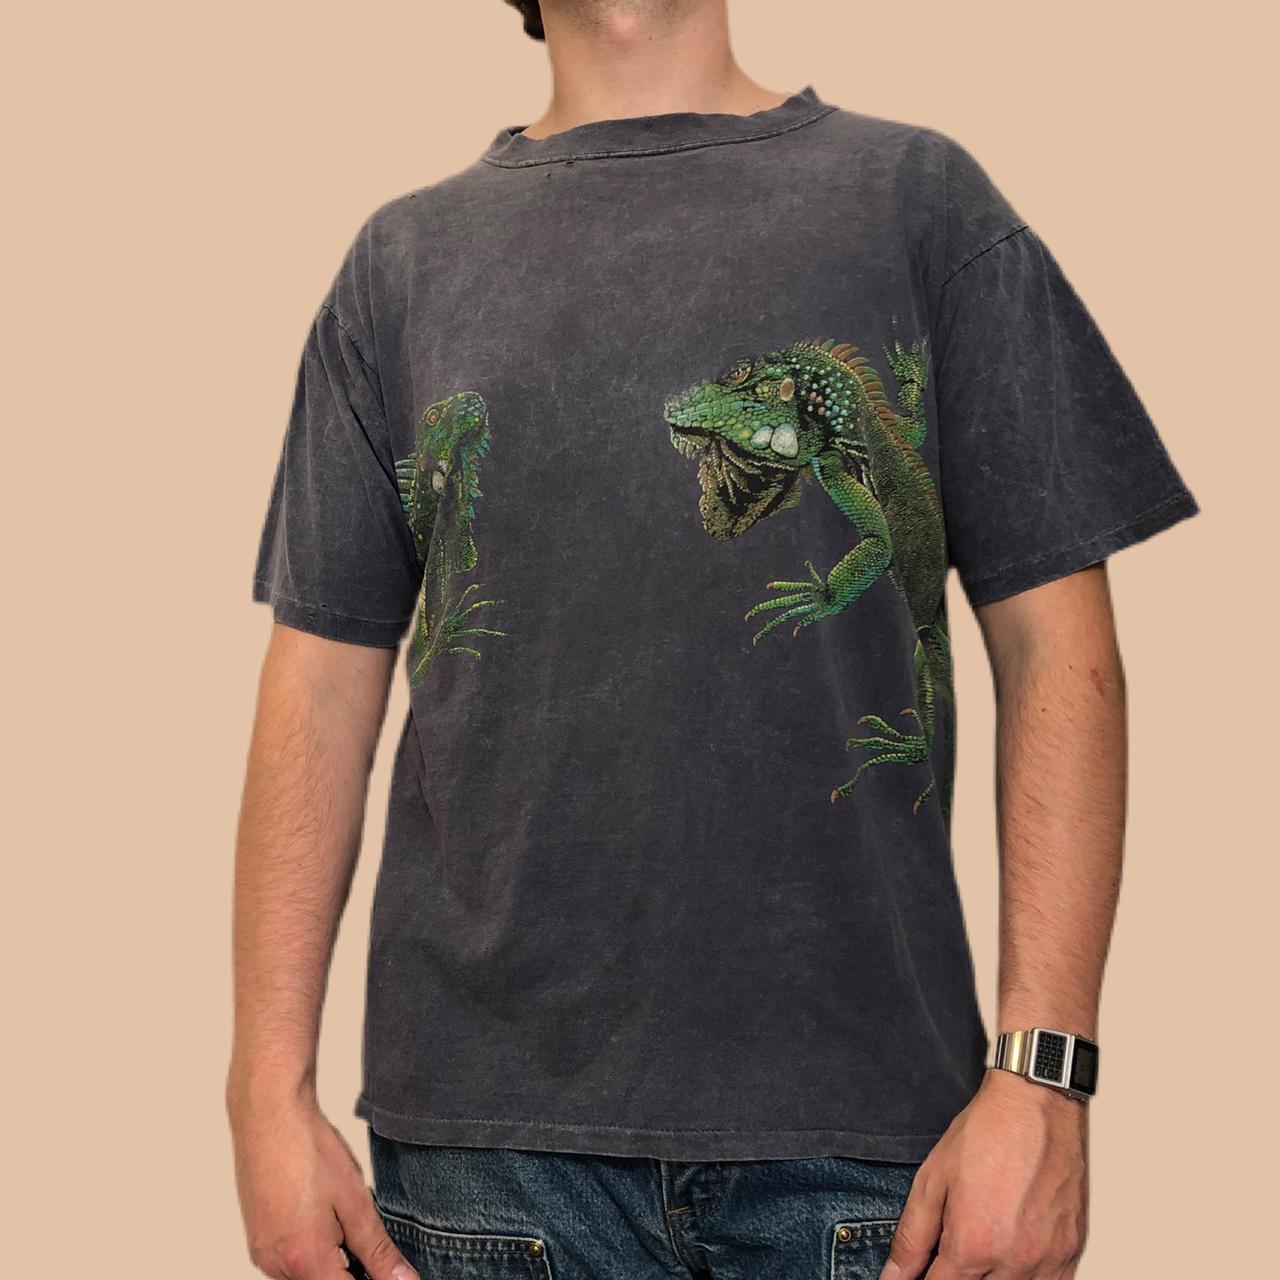 Product Image 1 - 🔥🦎VINTAGE REPTILE SHIRT🦎🔥 -Vintage Harlequin shirt